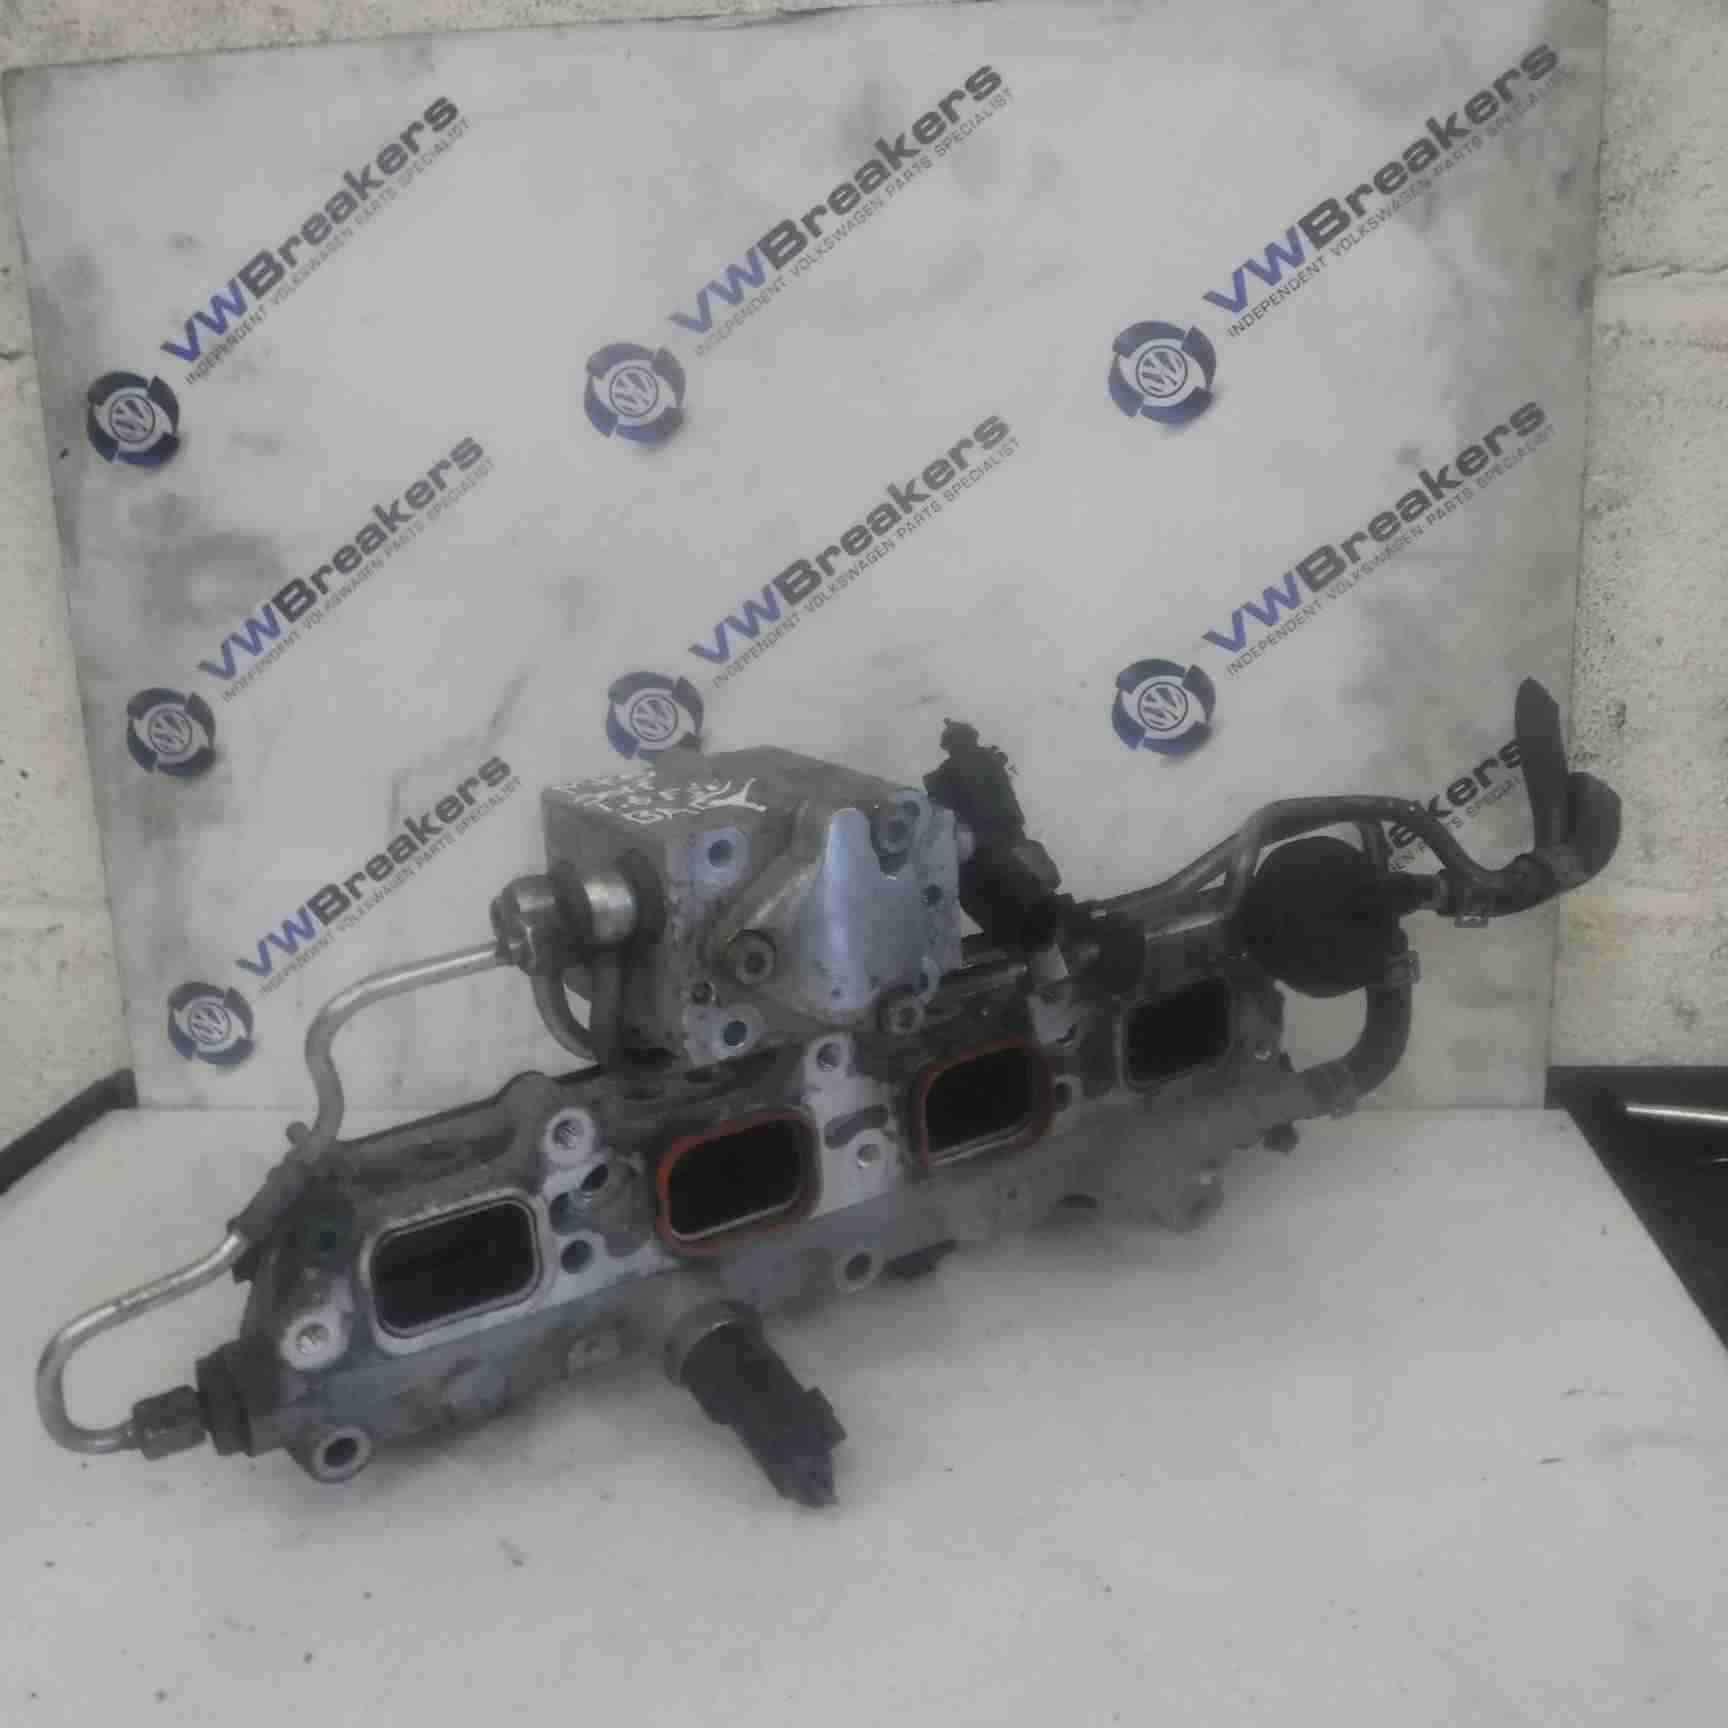 Volkswagen Golf MK5 2003-2009 1.6 FSi Fuel Injectors Rail Inlet Manifold BAG